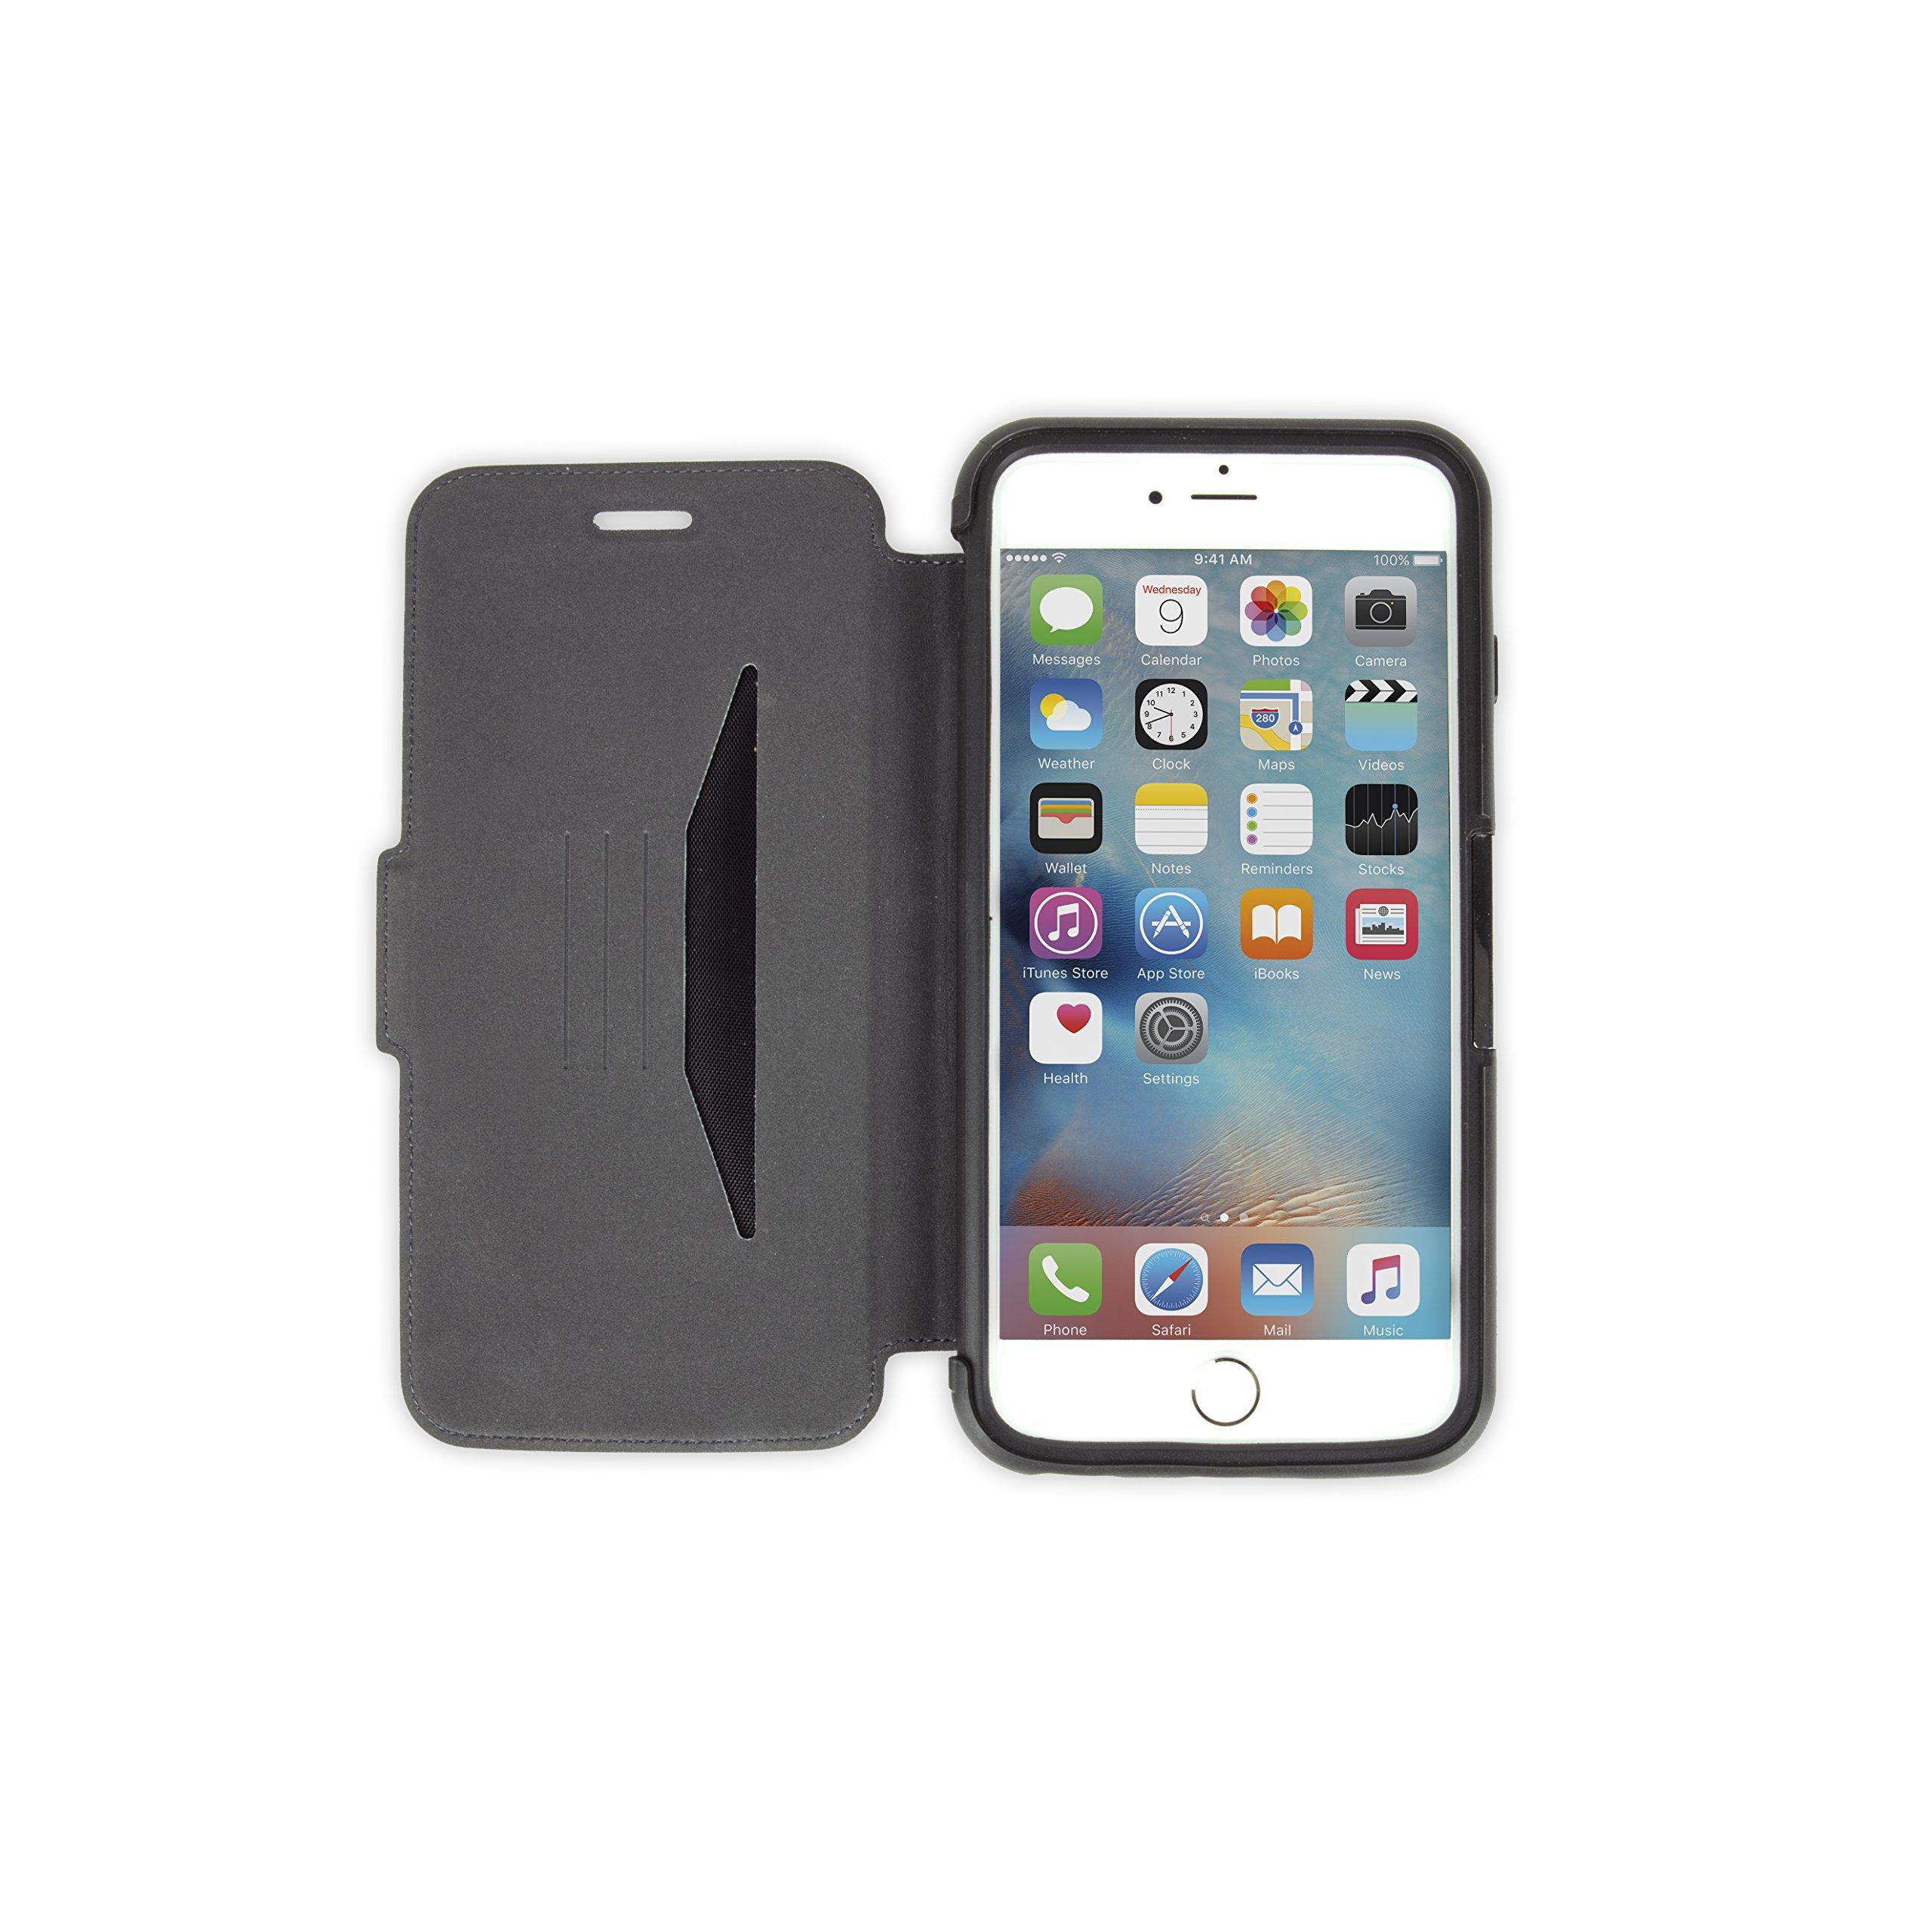 OtterBox STRADA SERIES iPhone 6 Plus/6S Plus Case- Retail Packaging - NEW MINIMALISM (BLACK/DARK GREY/BLACK LTHR FOLIO) by OtterBox (Image #3)